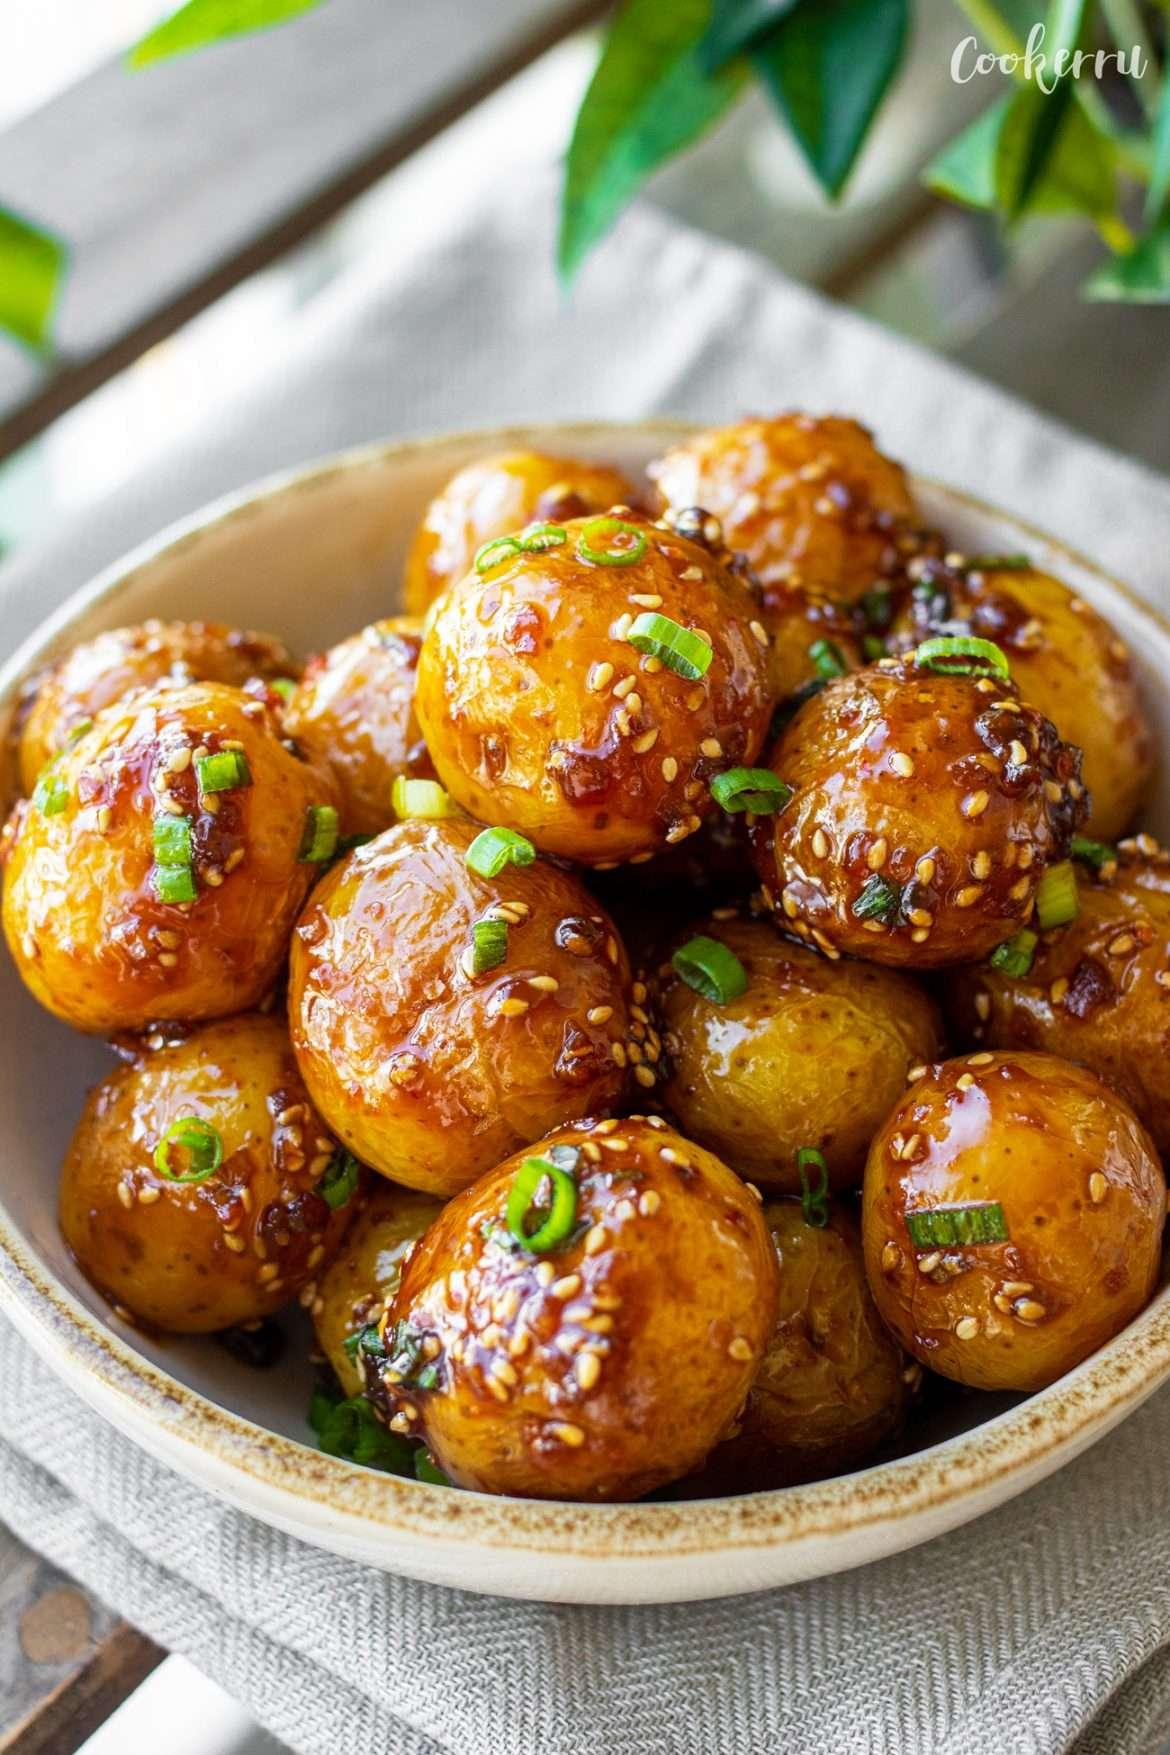 Korean Braised Potatoes (Gamja Jorim)